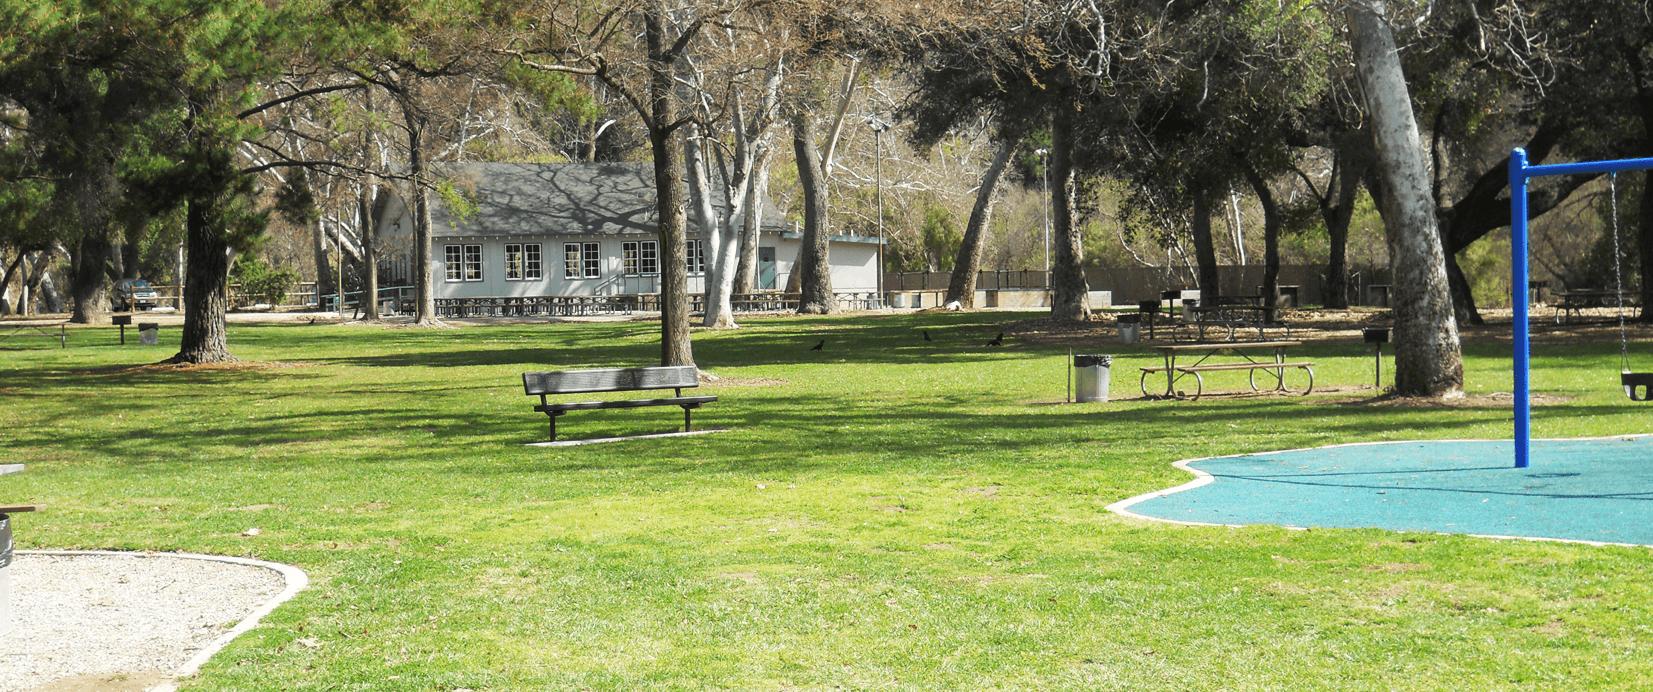 Comfort Park